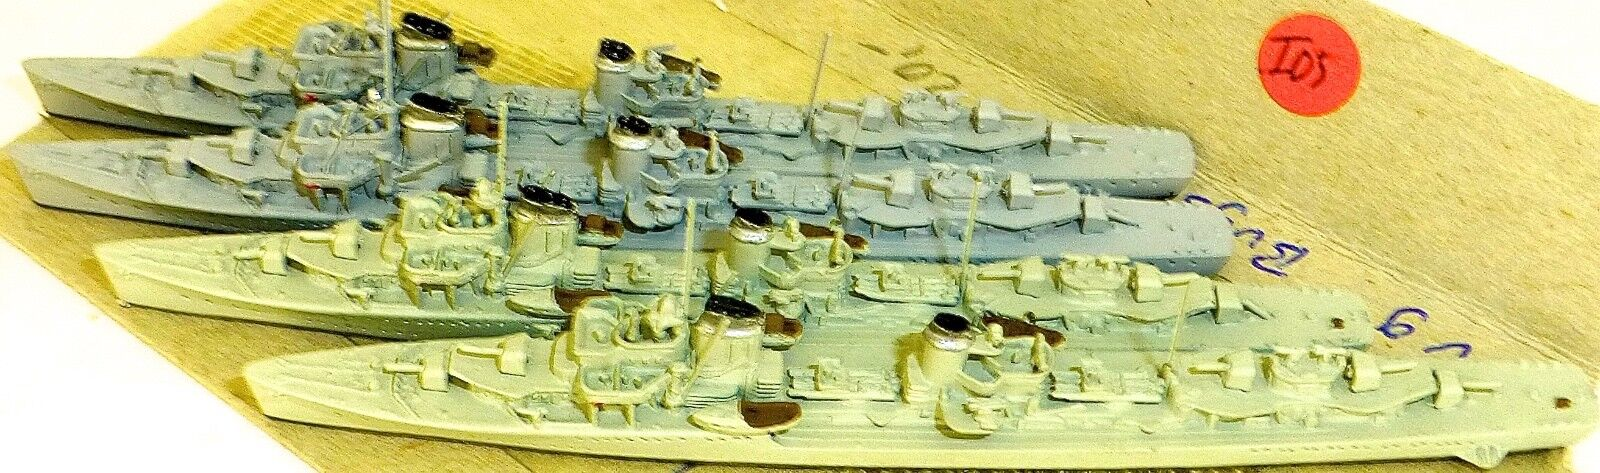 4 Pezzo Z 1-4 Cacciatorpediniere Neptun 1065 Modello Barca 1:1250 SHPI05 Å